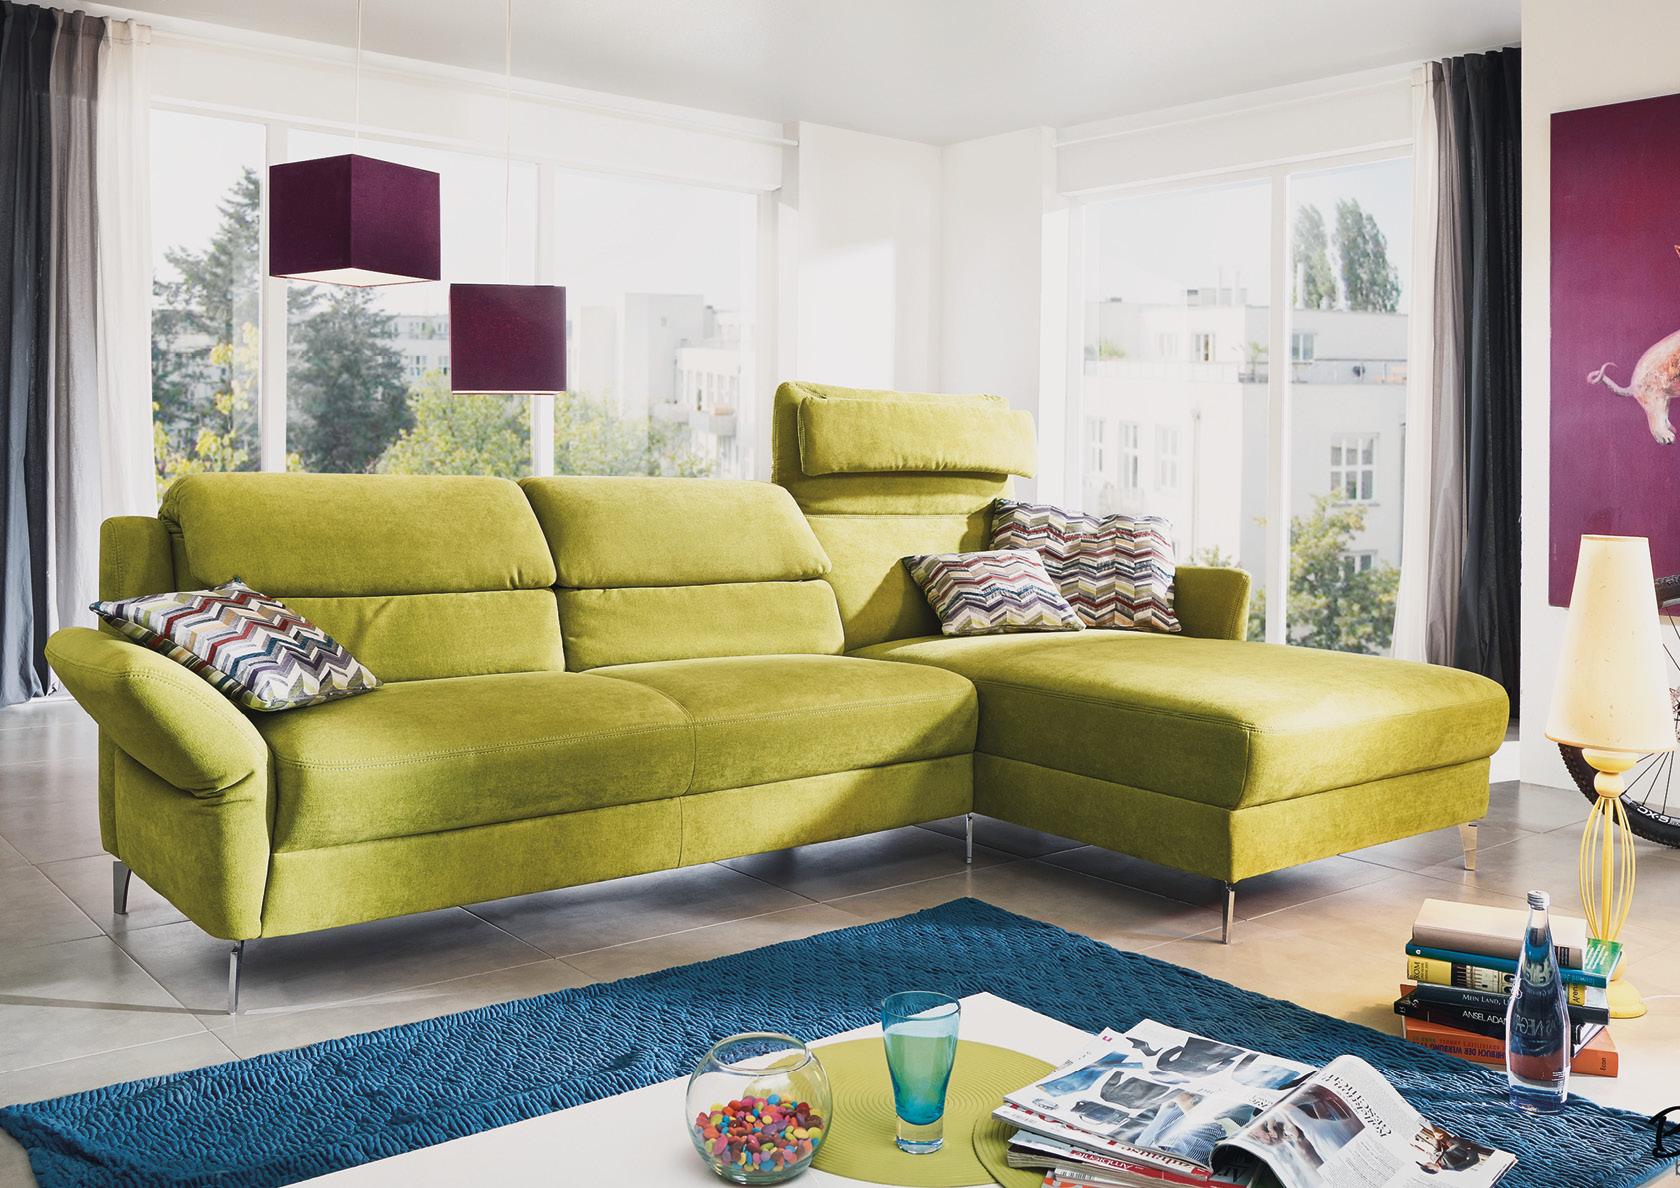 Sofas & Garnituren - ROERS RAUMGESTALTUNG Inh. Christian ...